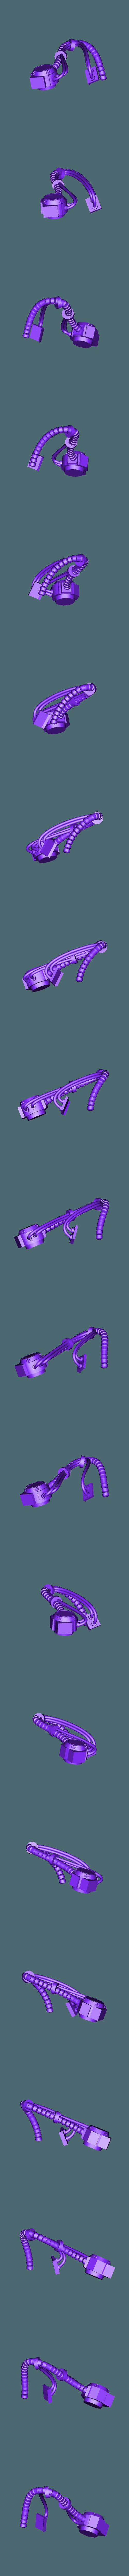 Aggressor_4_left_hoses.stl Download free STL file Flame Armed Instigators • 3D printable template, danny_cyanide